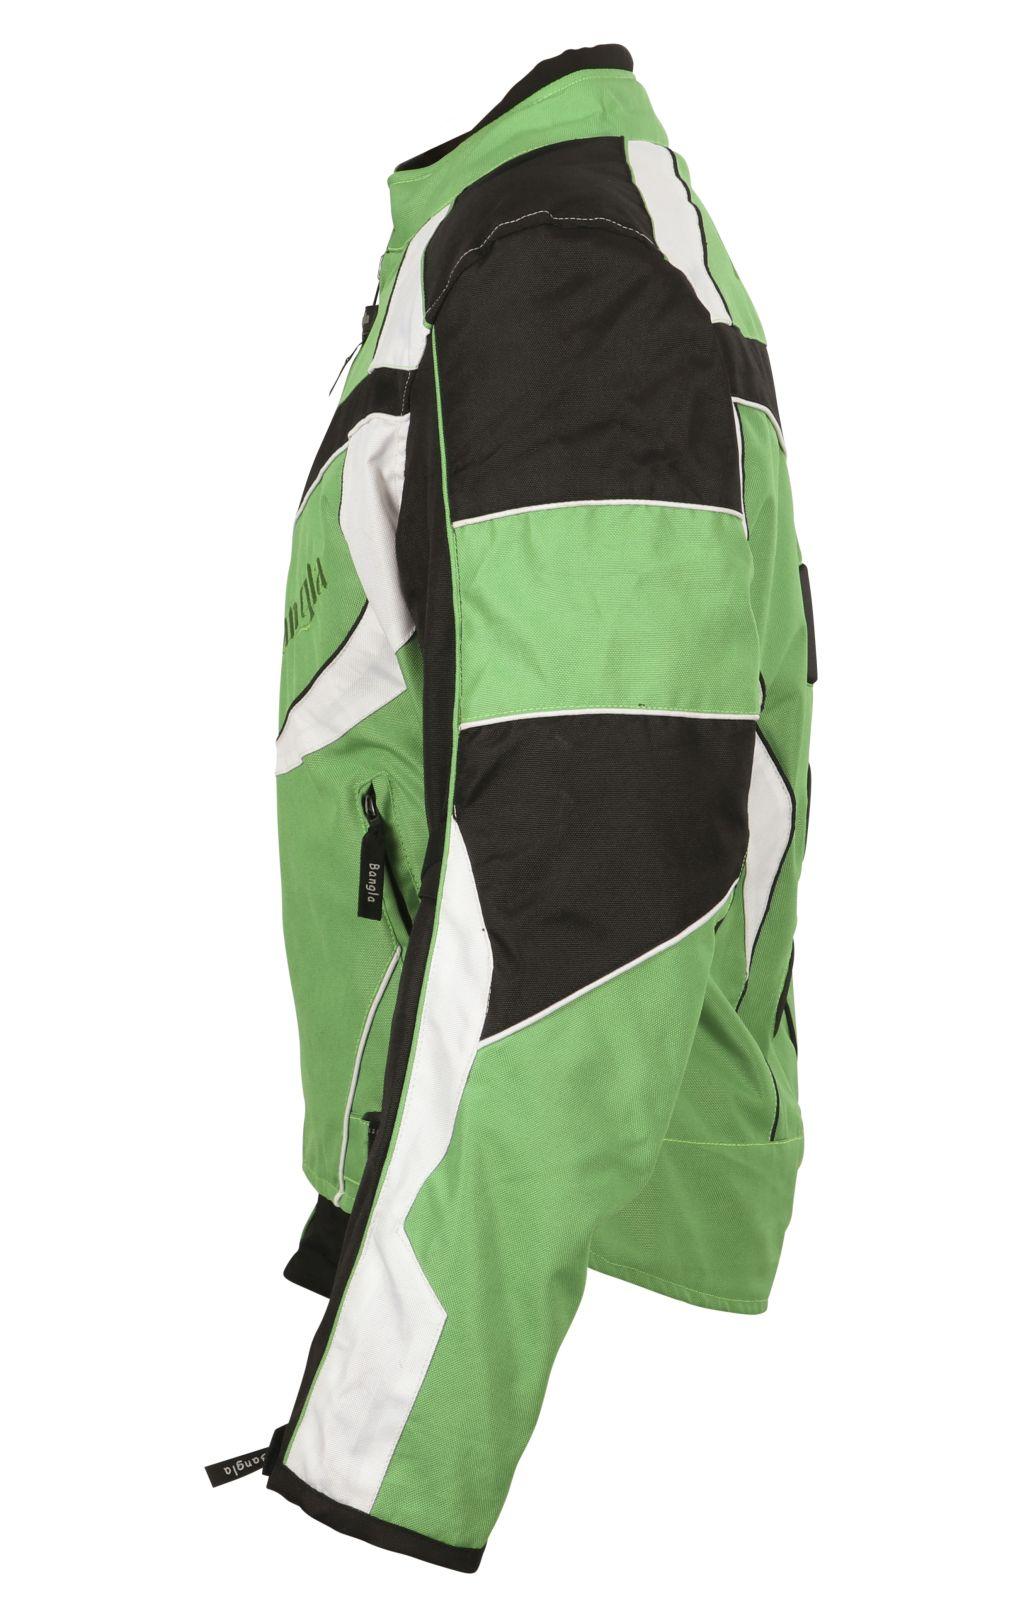 Sport Motorrad Textil Jacke Cordura grün schwarz weiss Motorradjacke M L - 4 XL